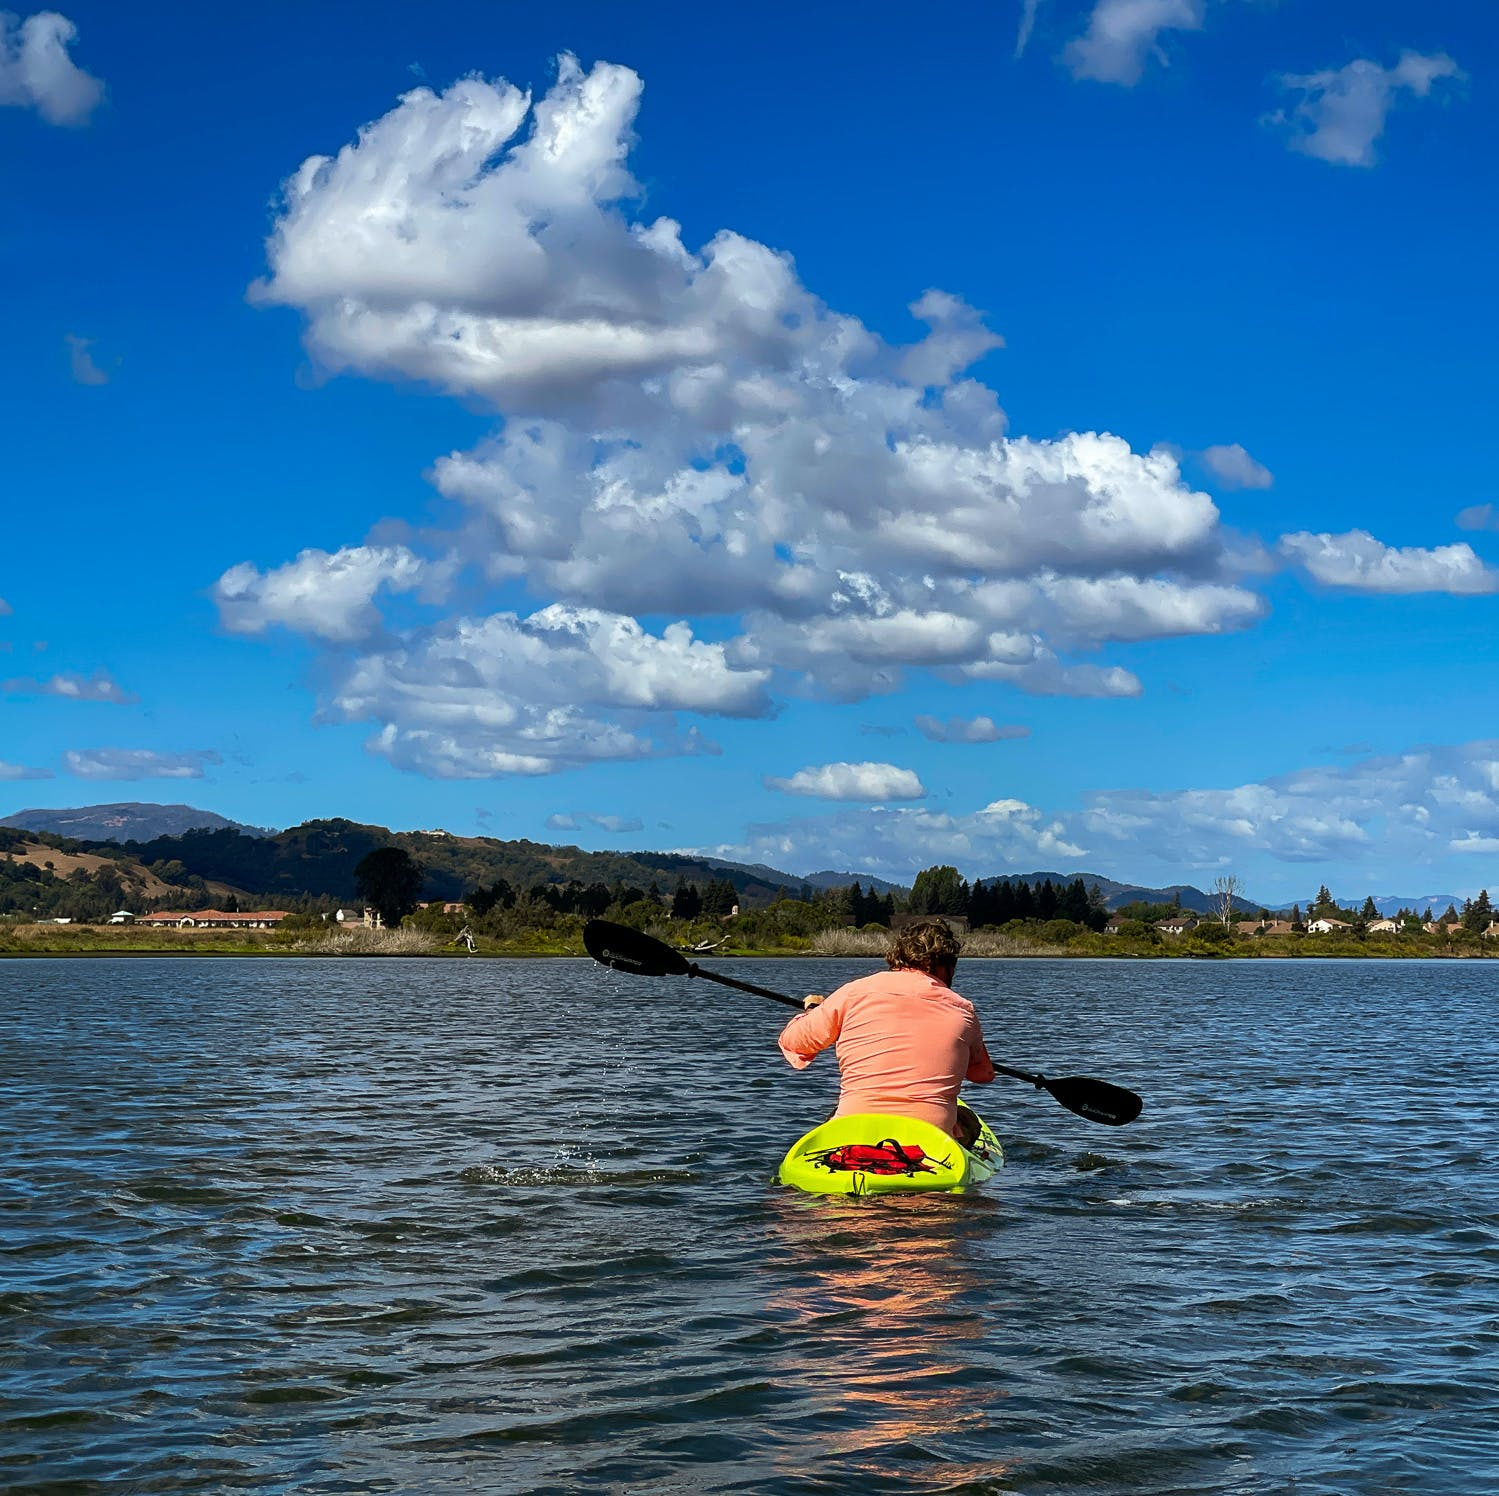 Kayak paddler on the Napa River via a Napa Valley Paddle adventure